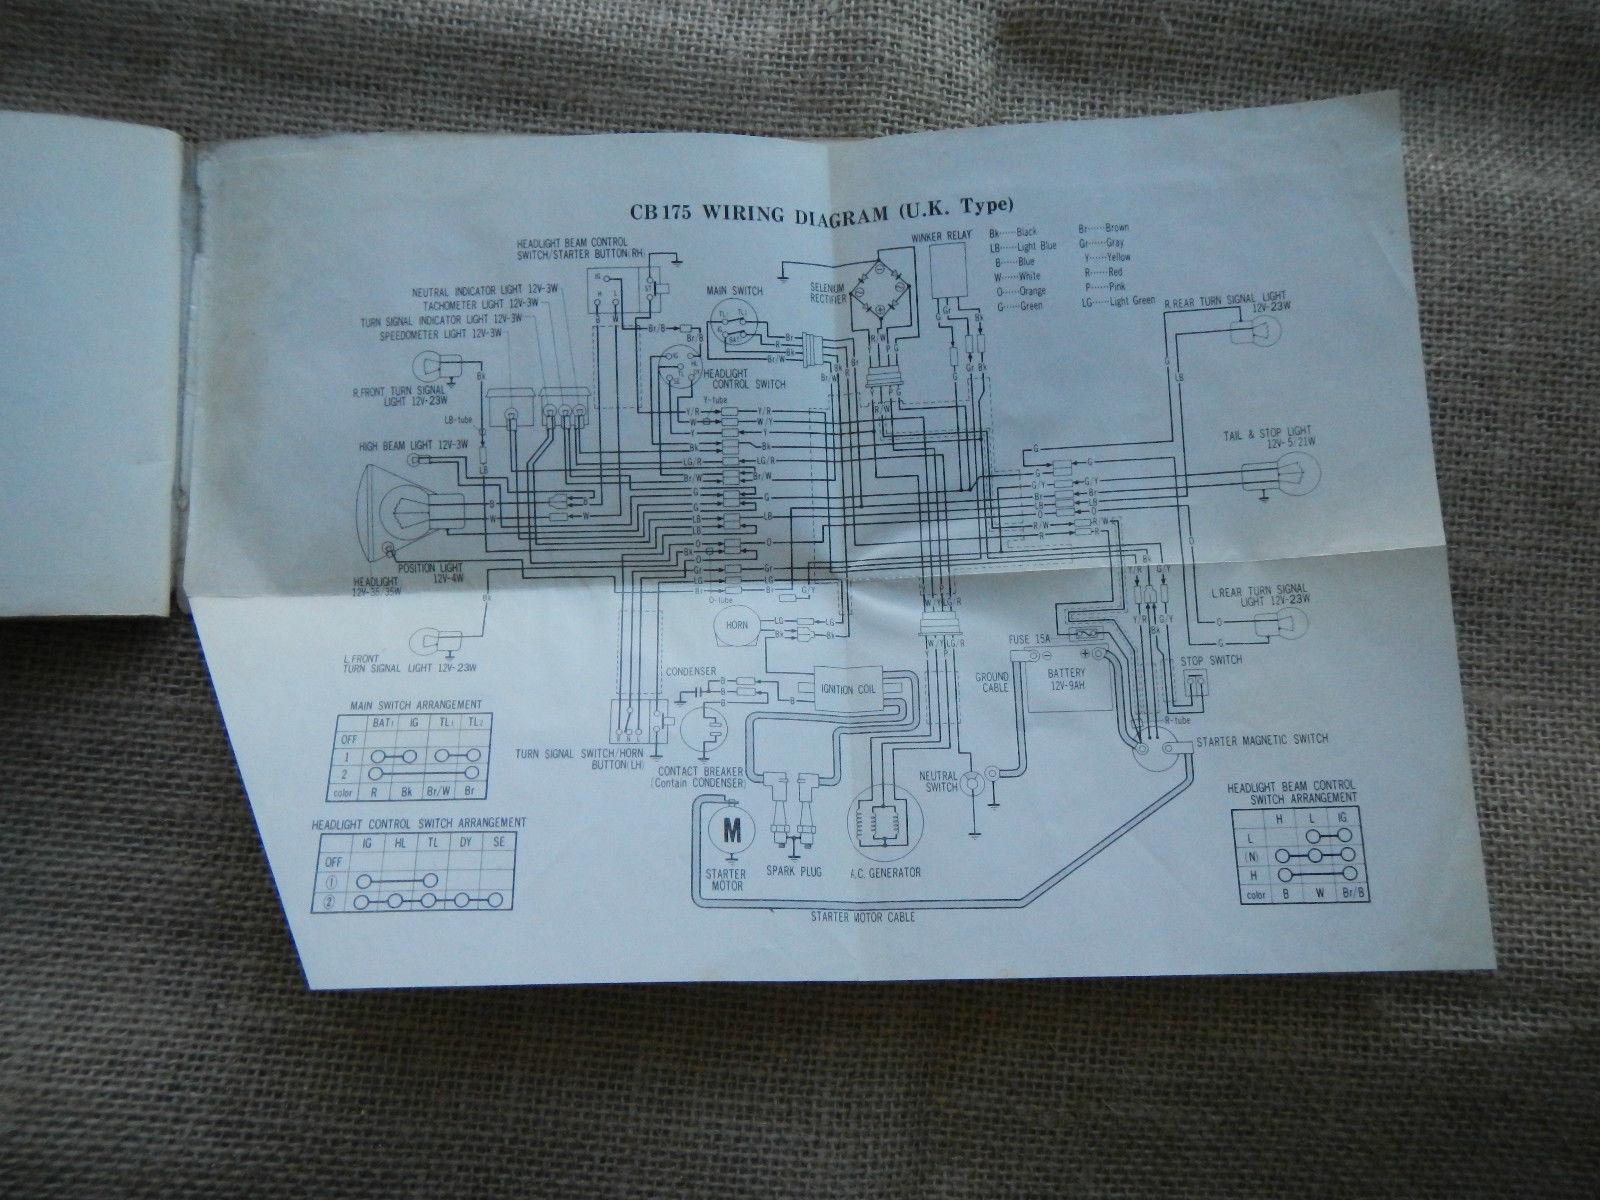 Cb 175 Wiring Diagram - Smart Wiring Diagrams •